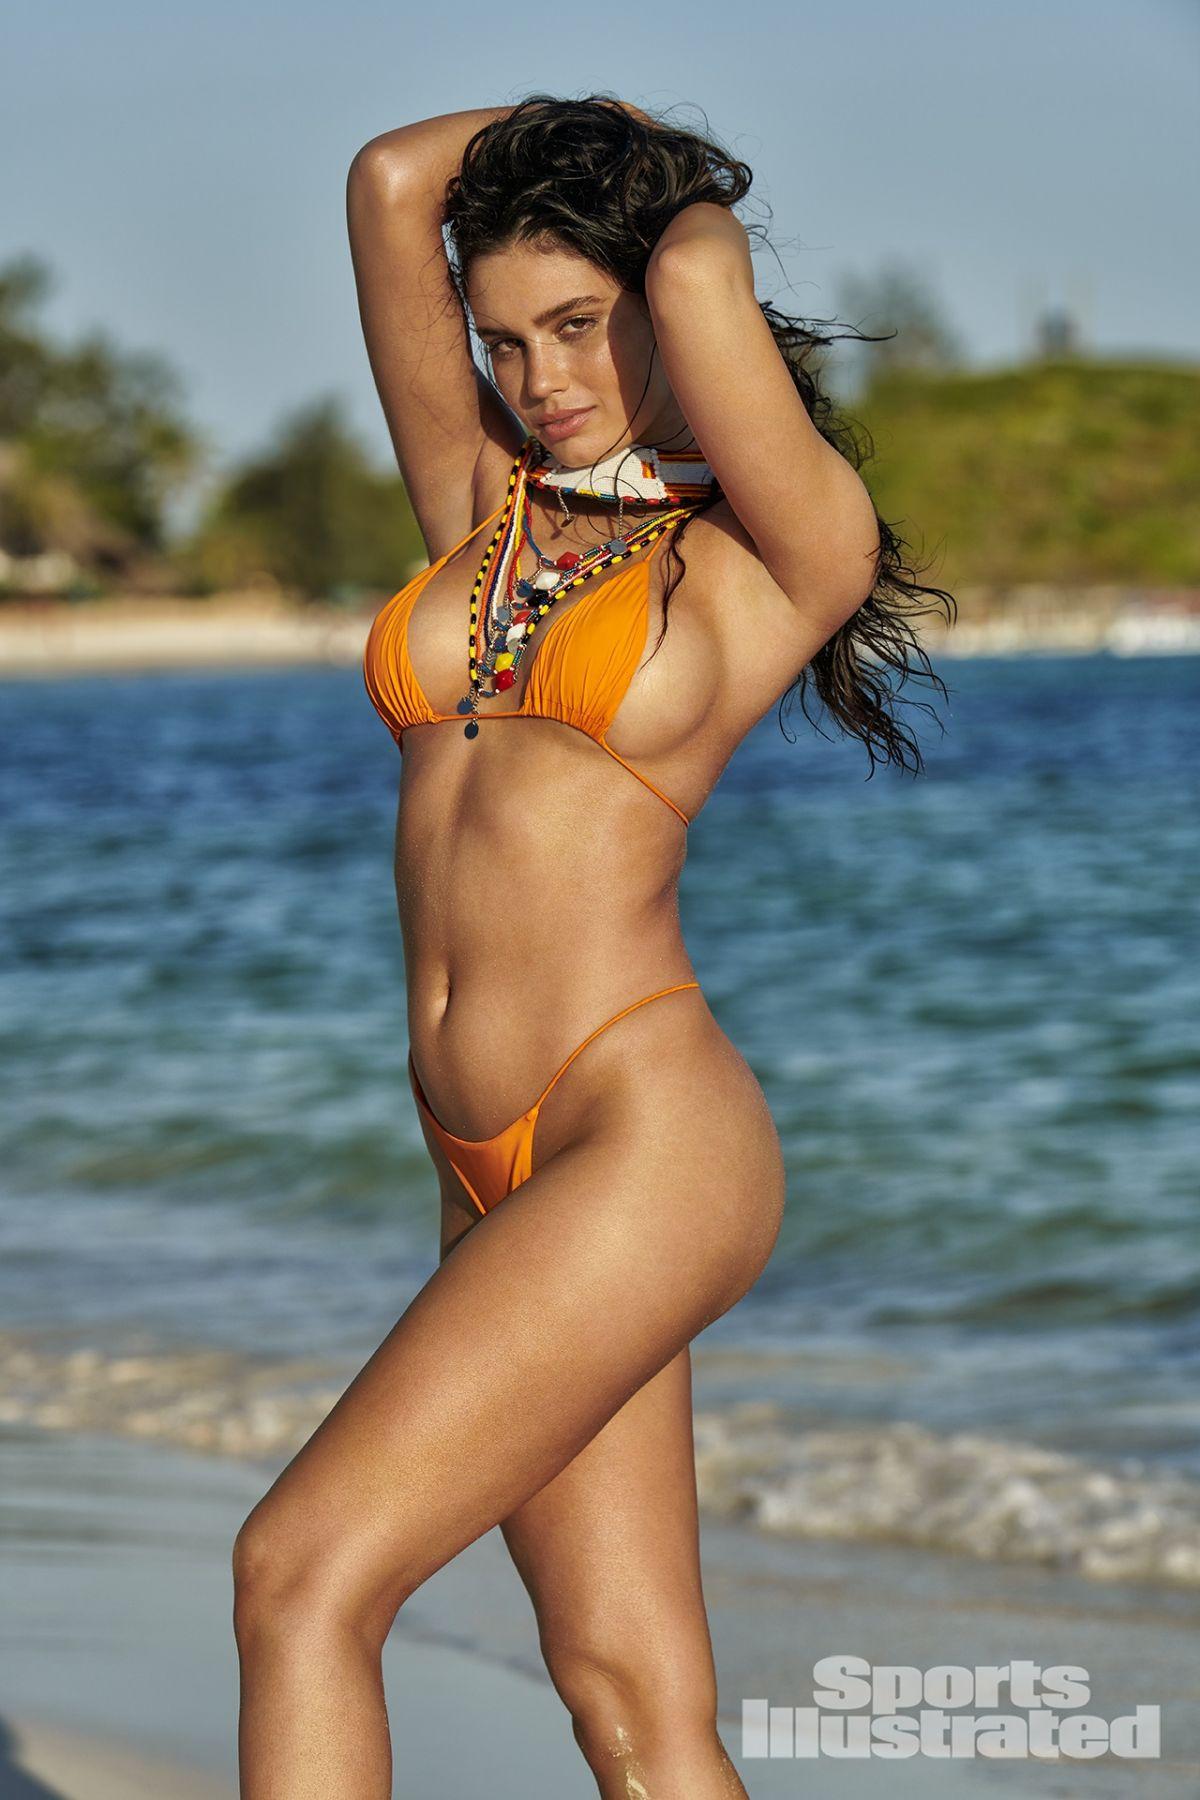 illustrated sports paula anne swimsuit issue si kenya tsai hawtcelebs gotceleb paint models bikini yu photographed hermanny vix